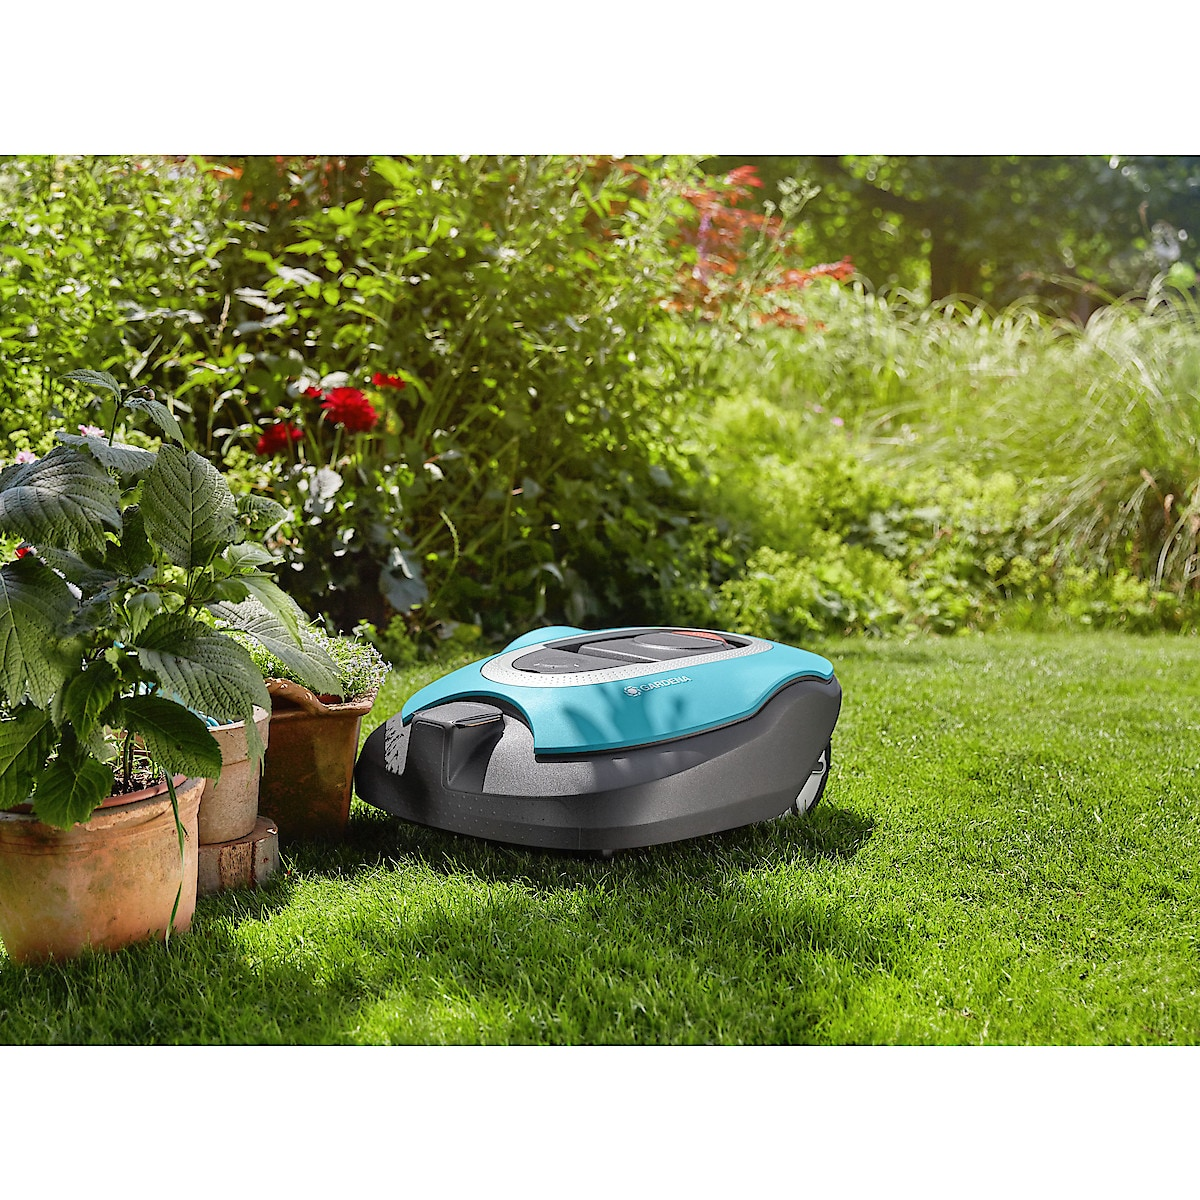 Robotgräsklippare Gardena Sileno